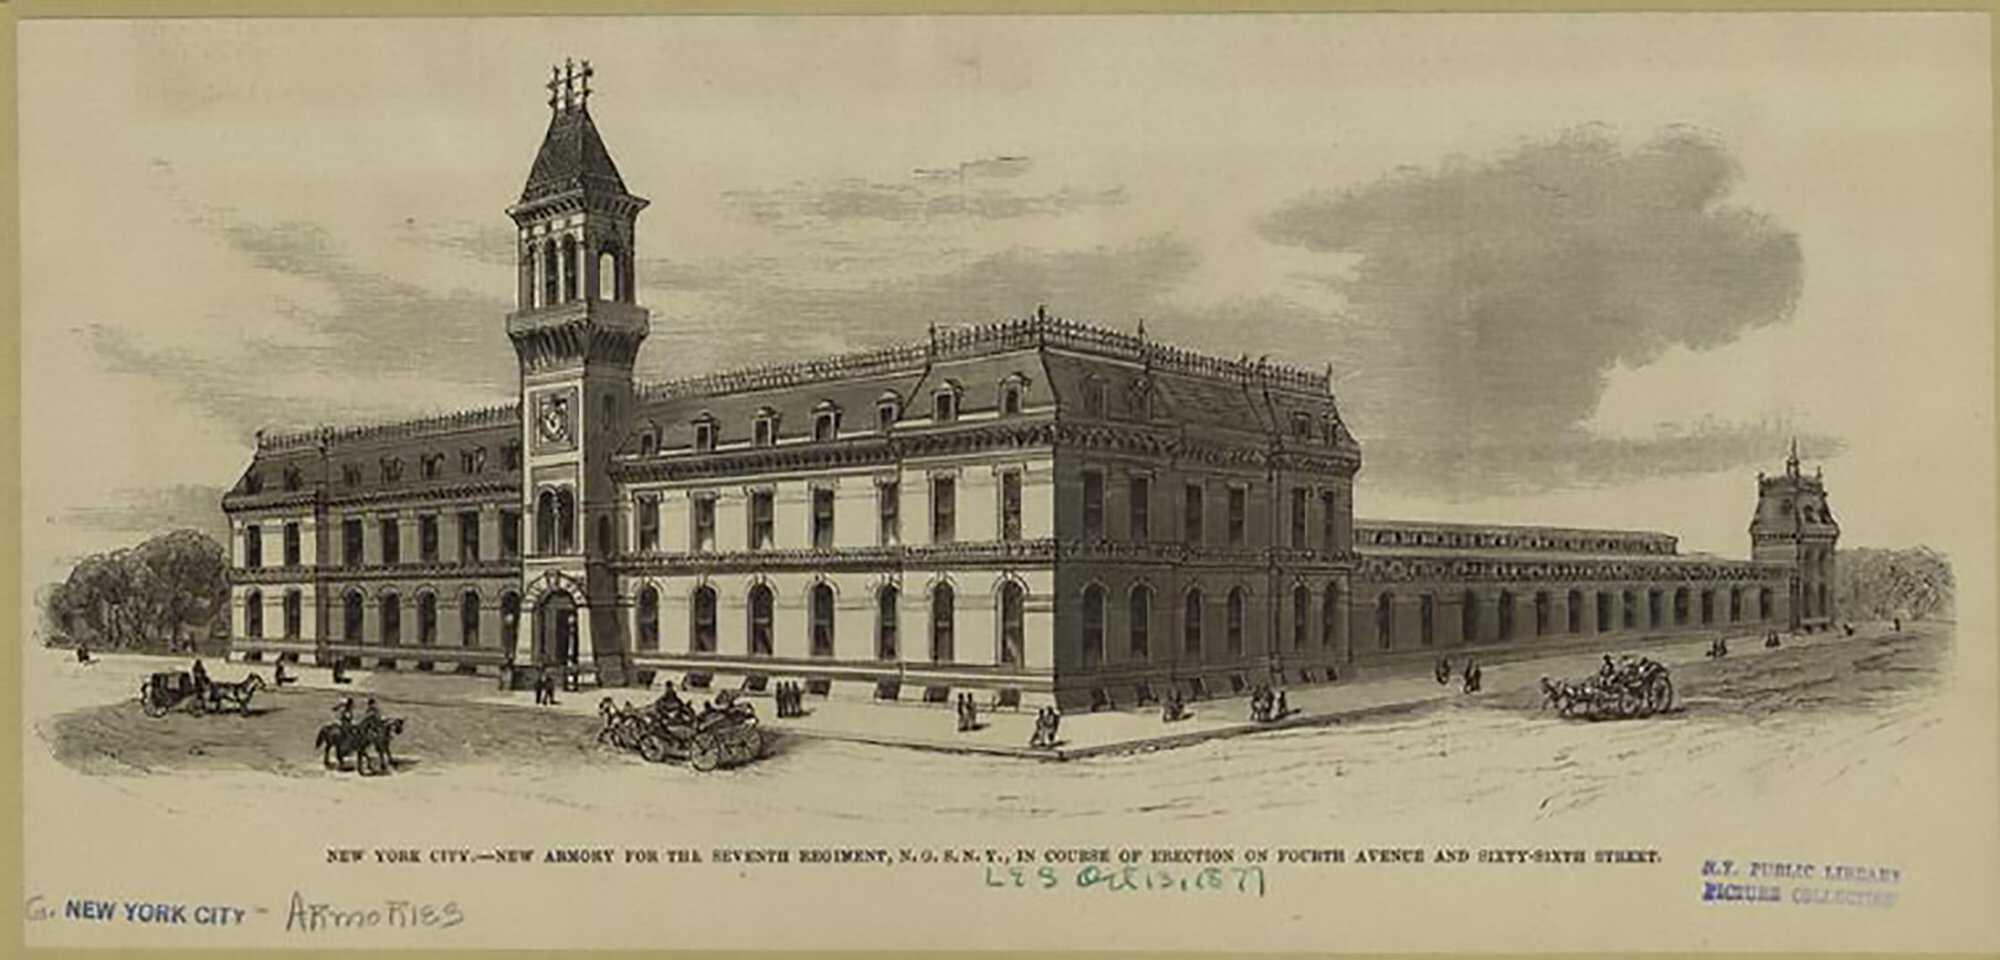 Gilded-New-York-Armory.jpg